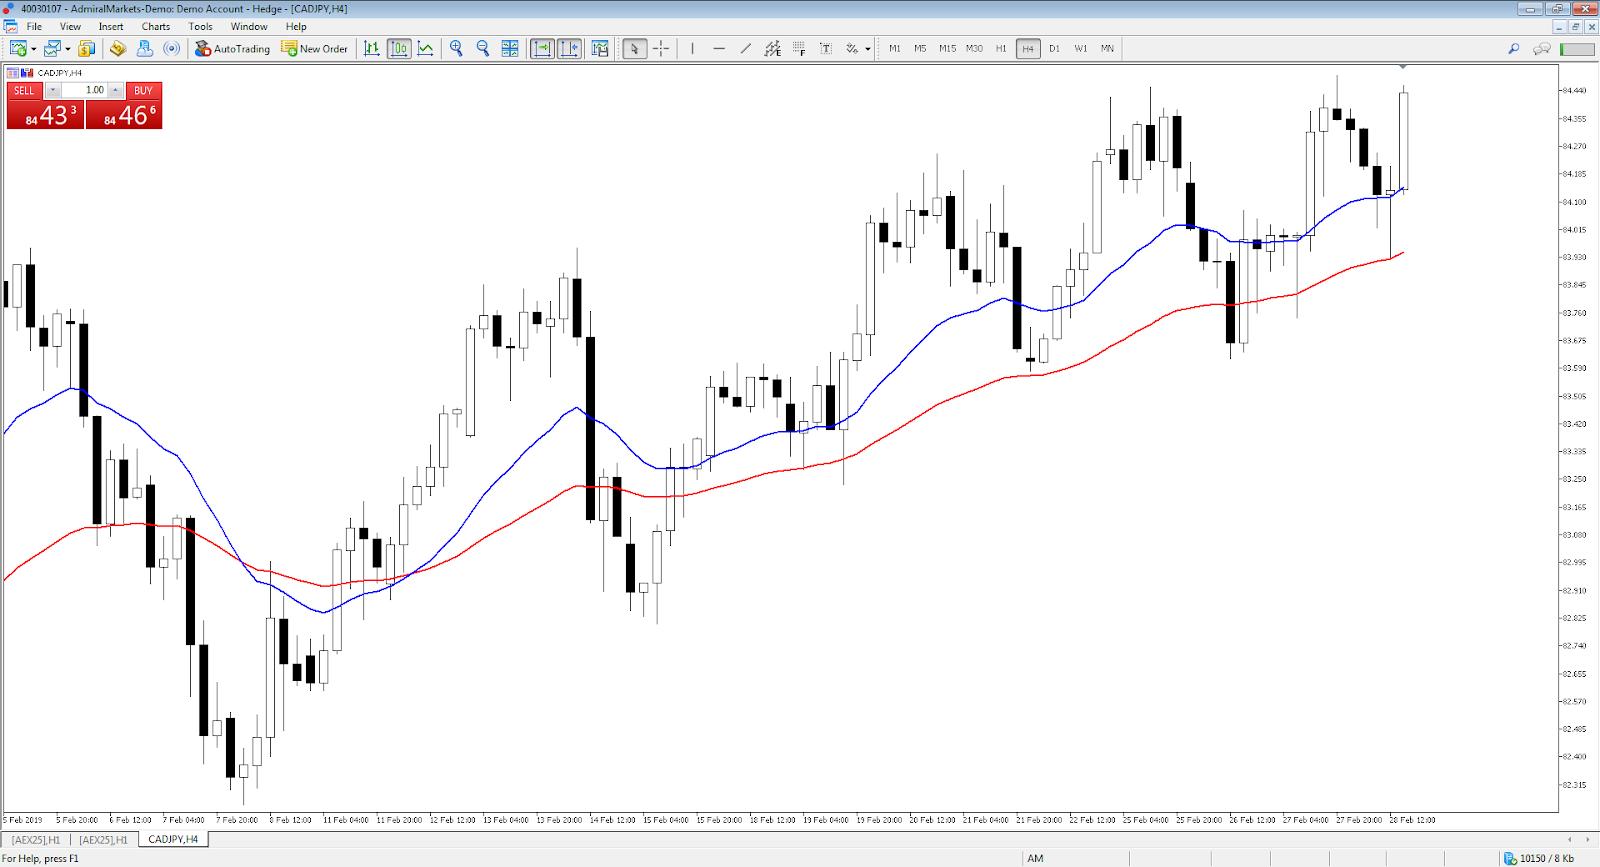 CAD/JPY hourly chart